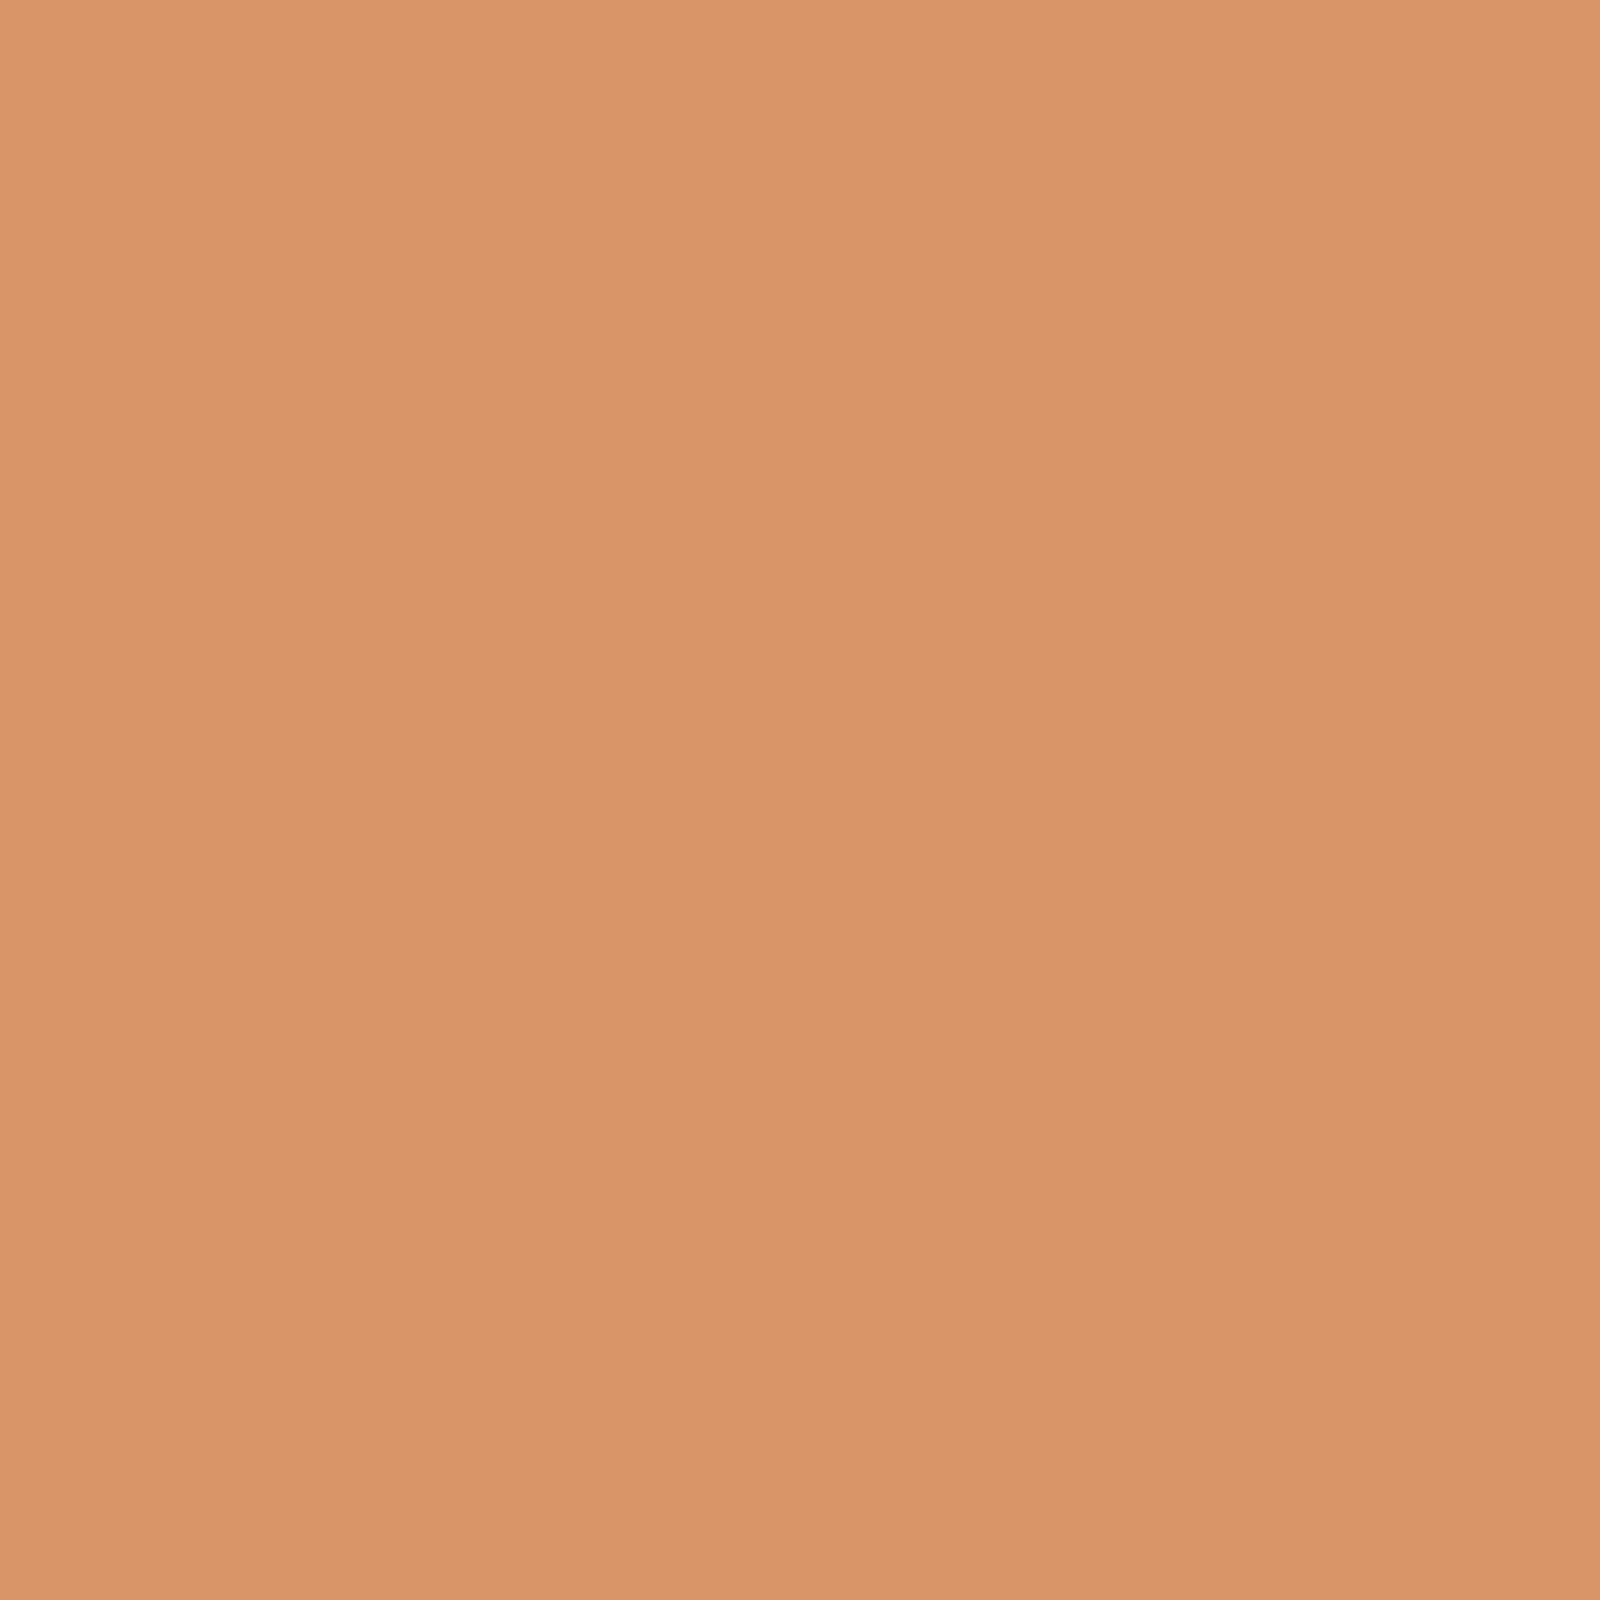 Cosmo Floss - 127 Light Yellowish Brown